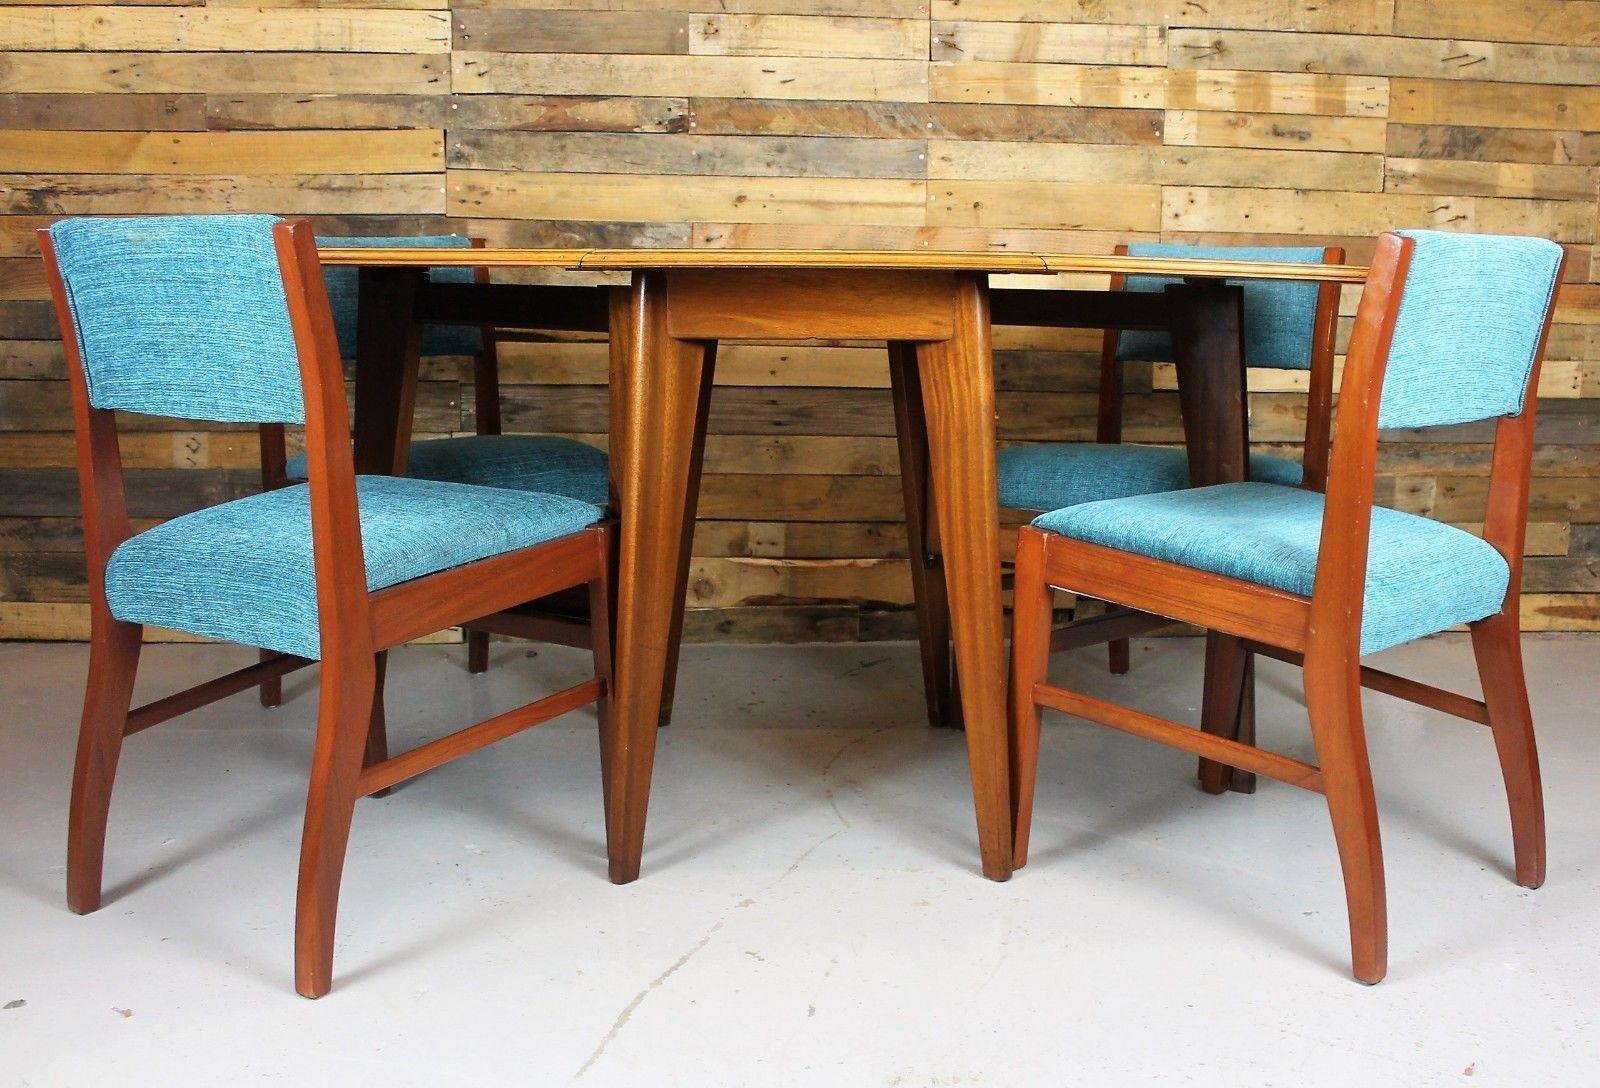 Vintage Retro Mid Century Morris Of Glasgow Cumbrae Range Dining Table And Chair Neil Morris Vinterior